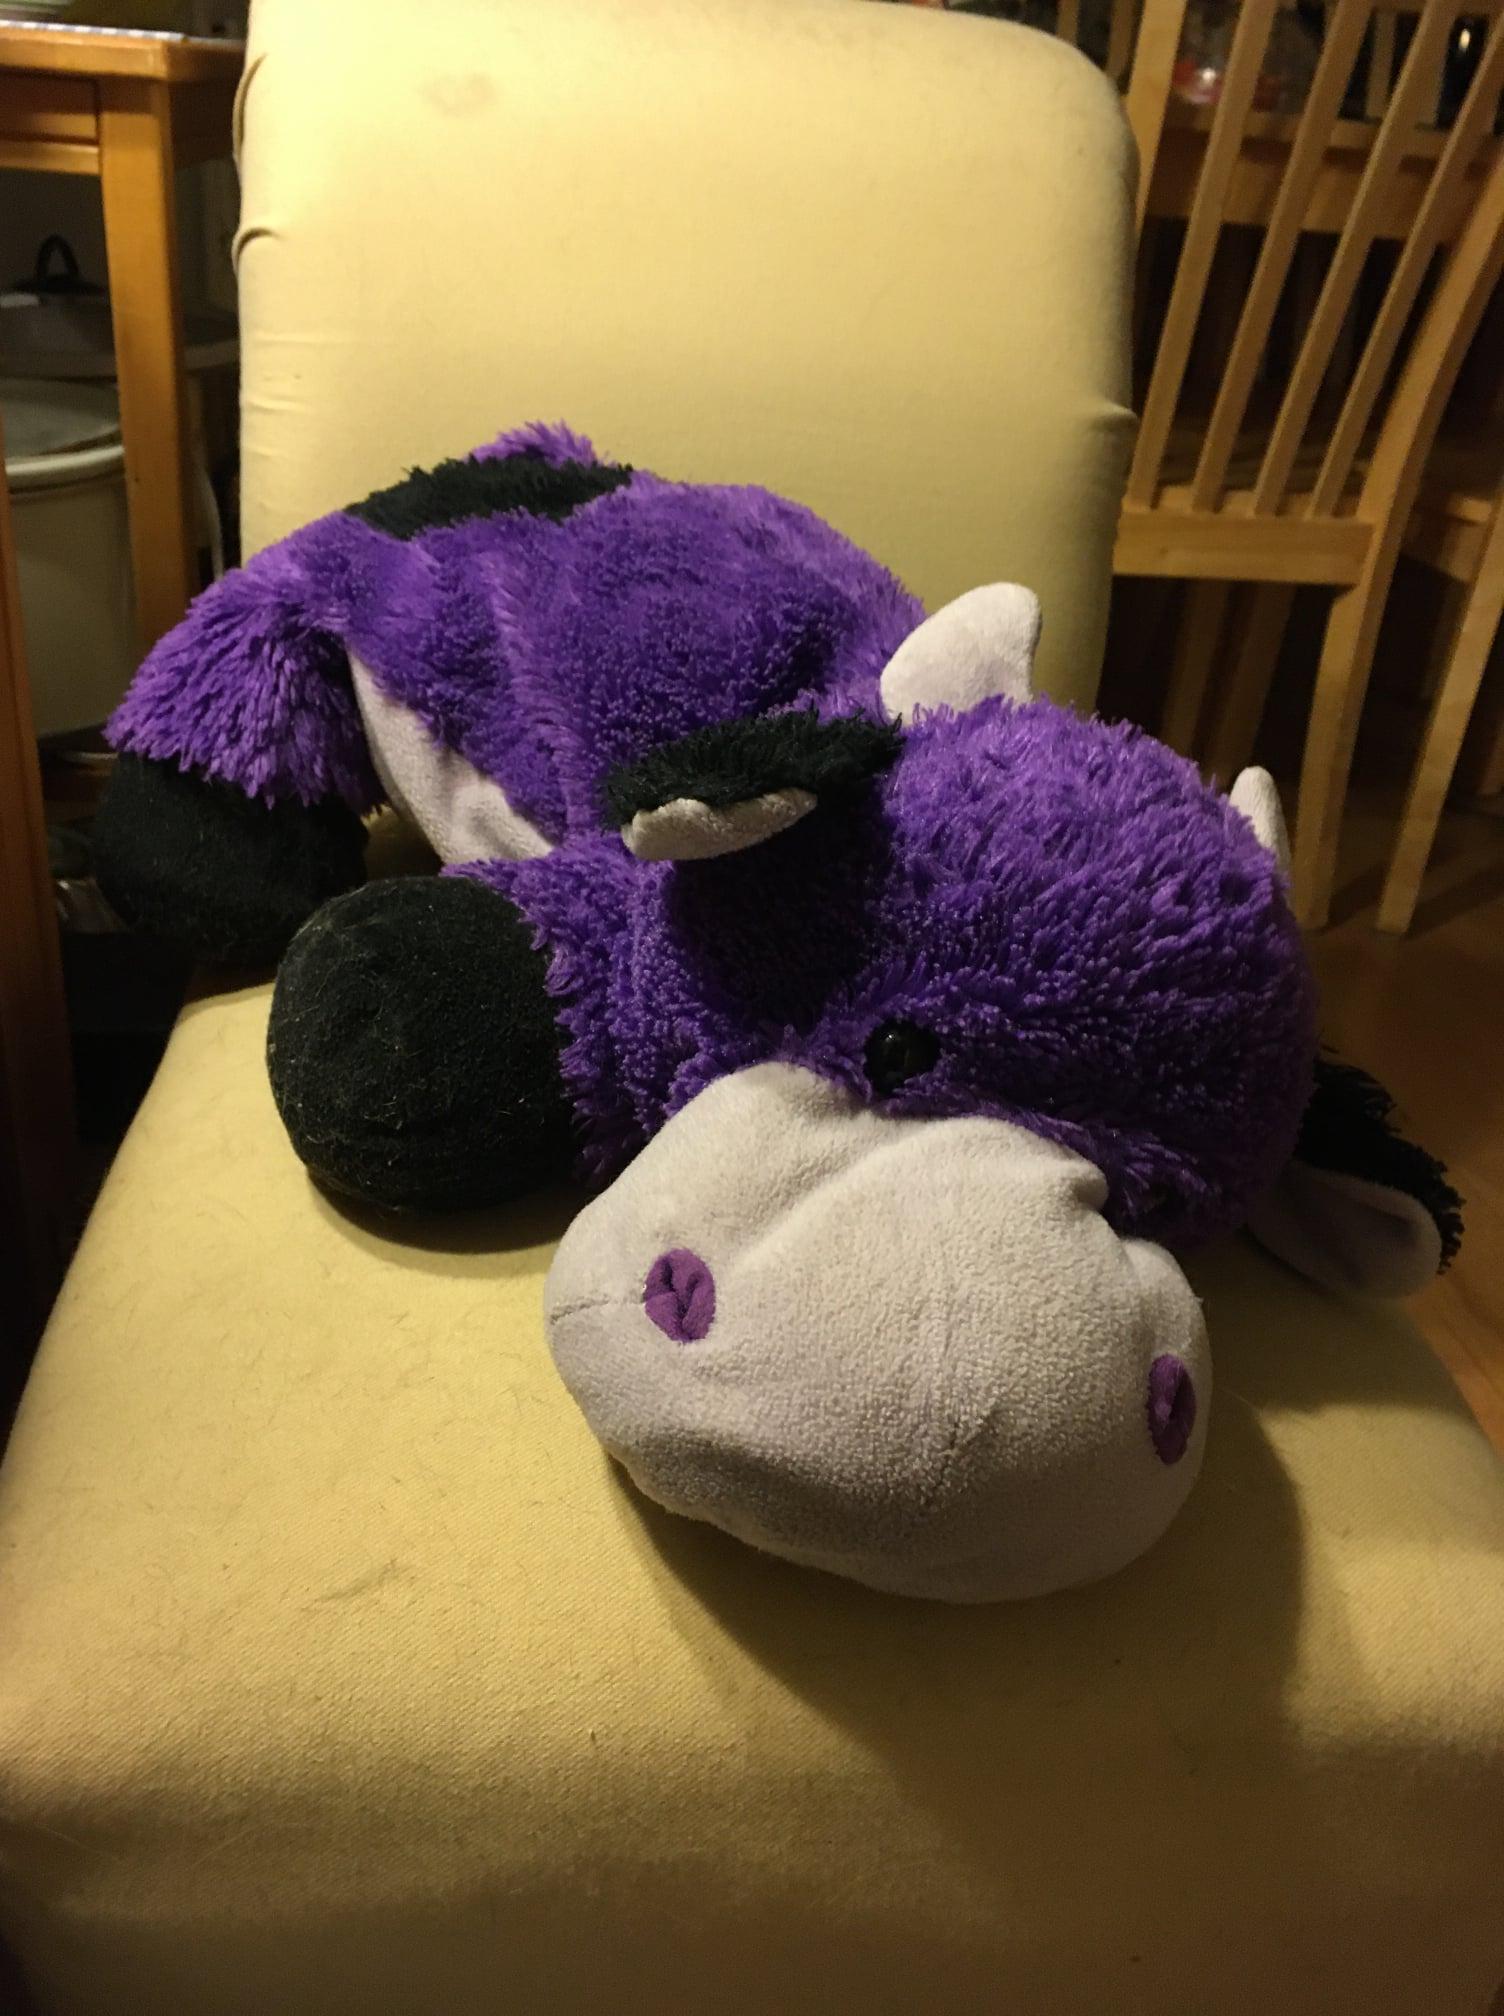 Sad Stuffed Cow